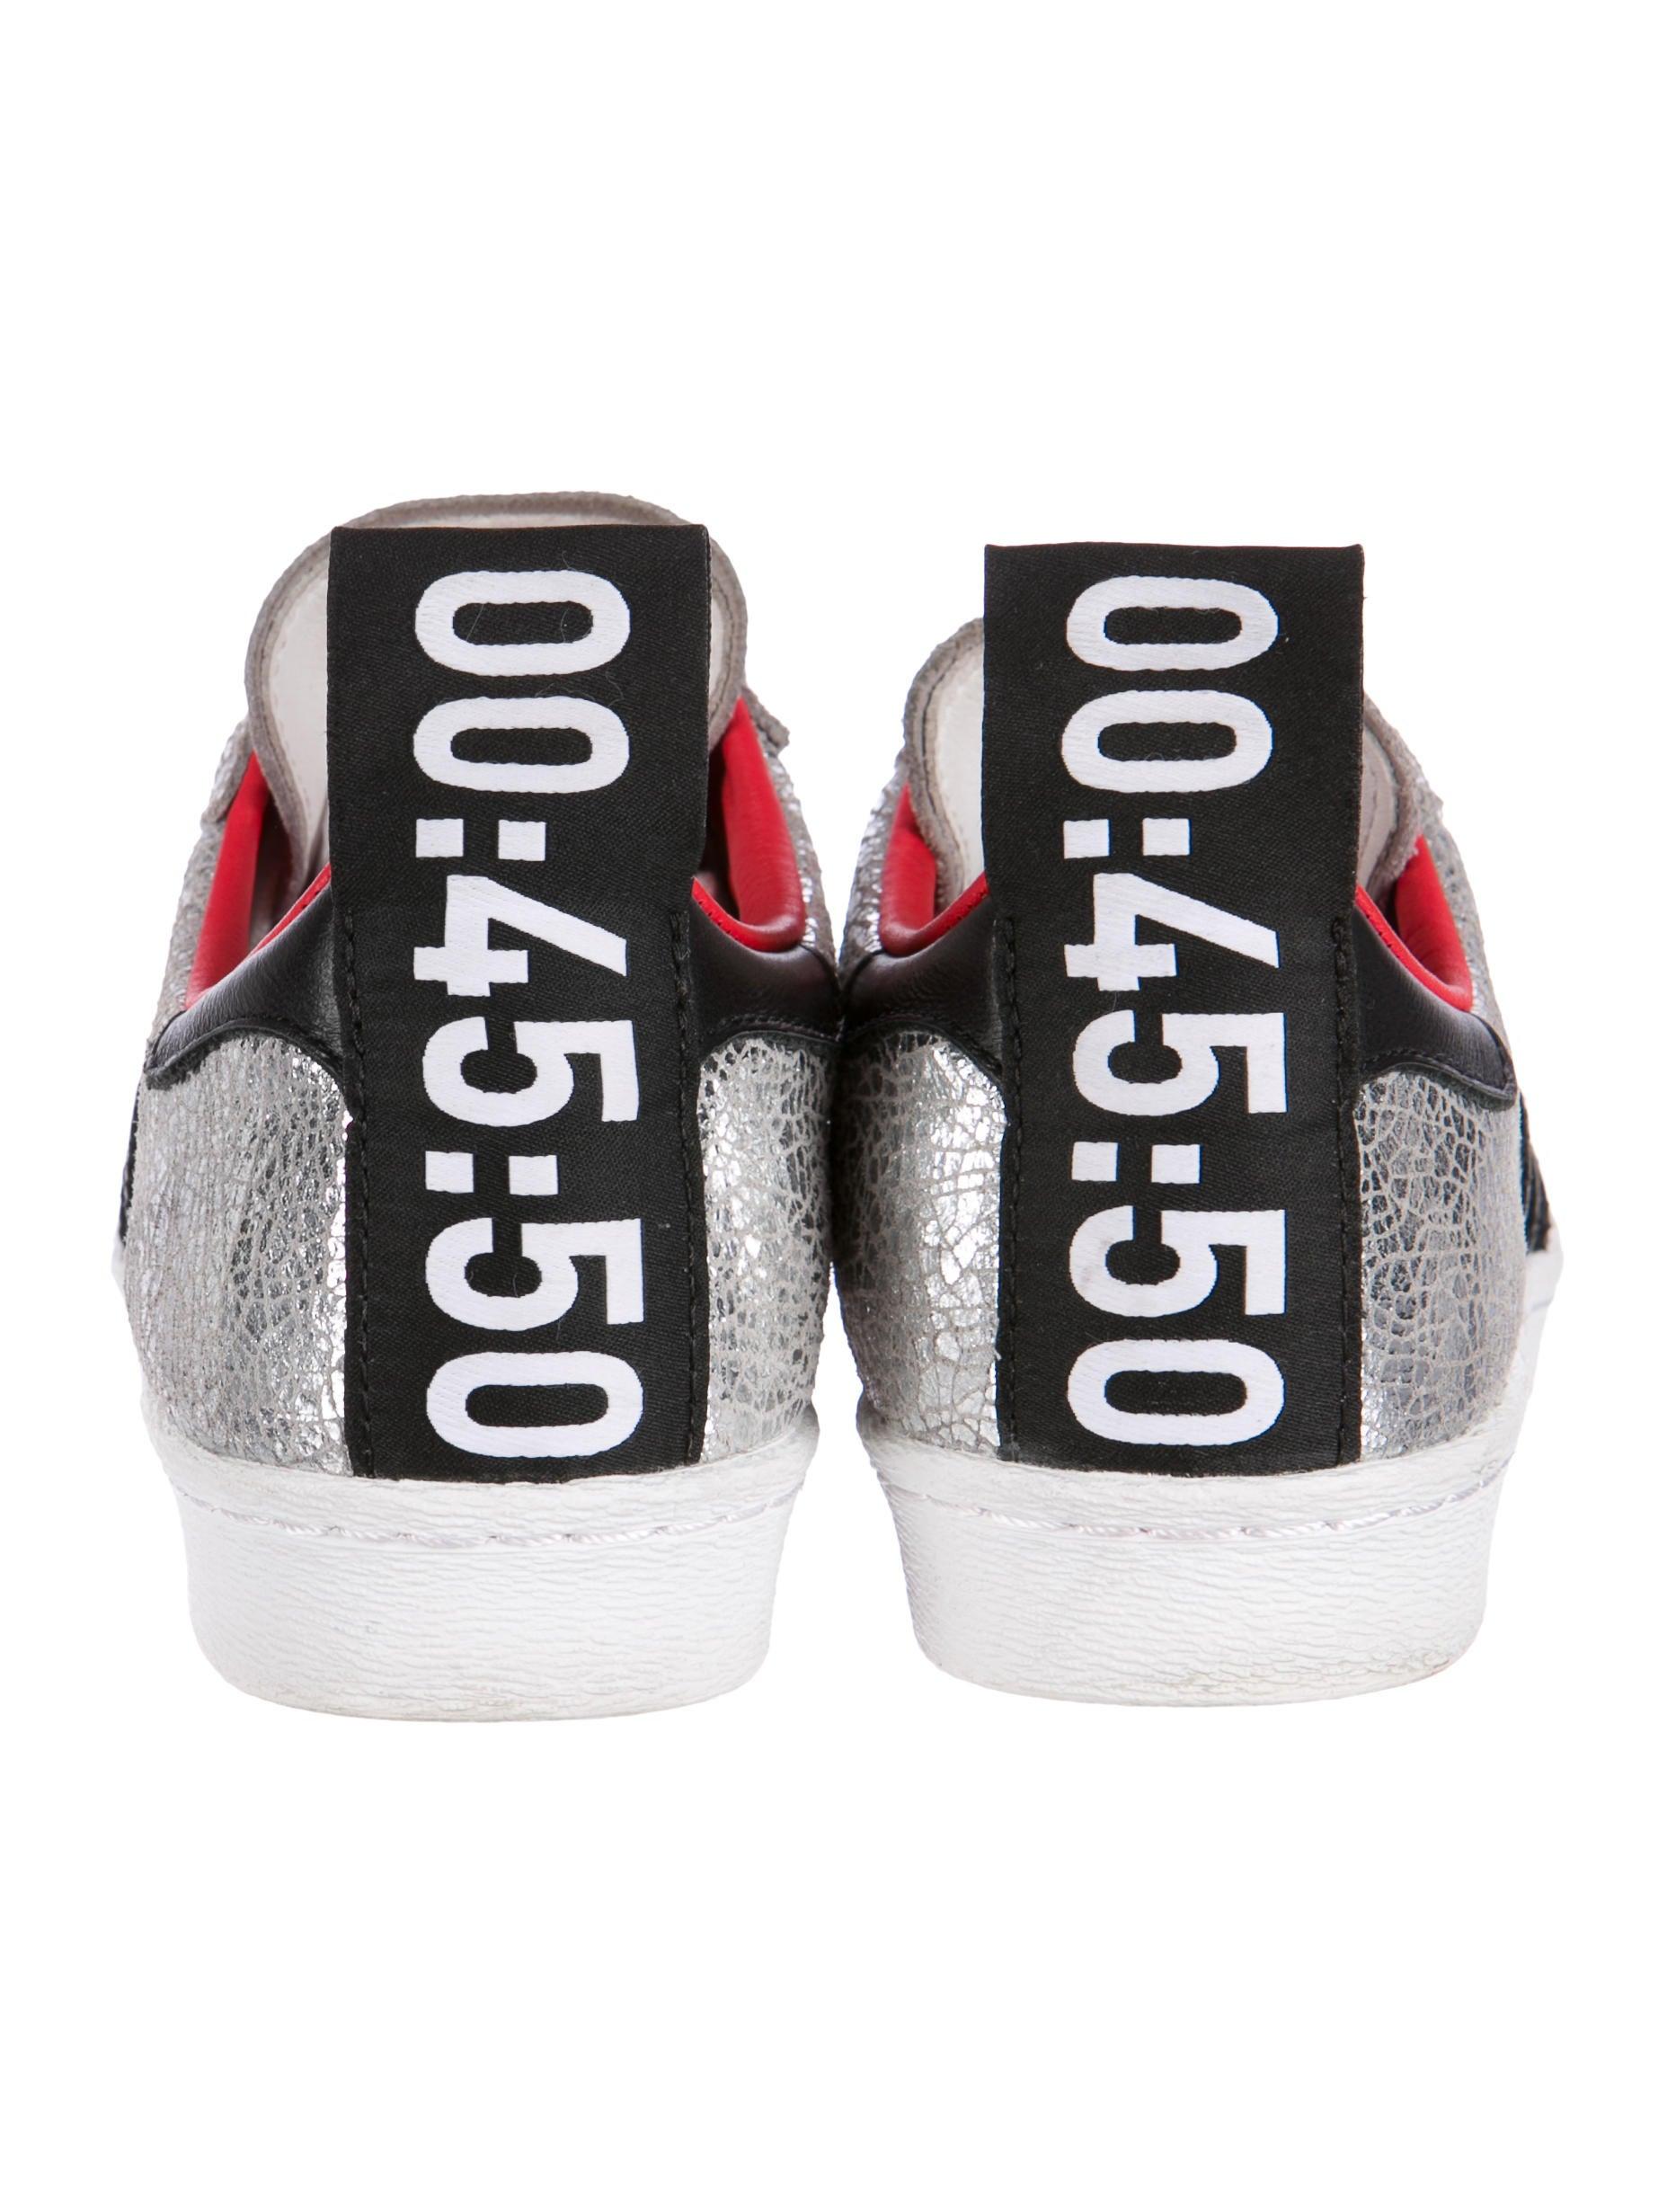 adidas superstar 00 45 50